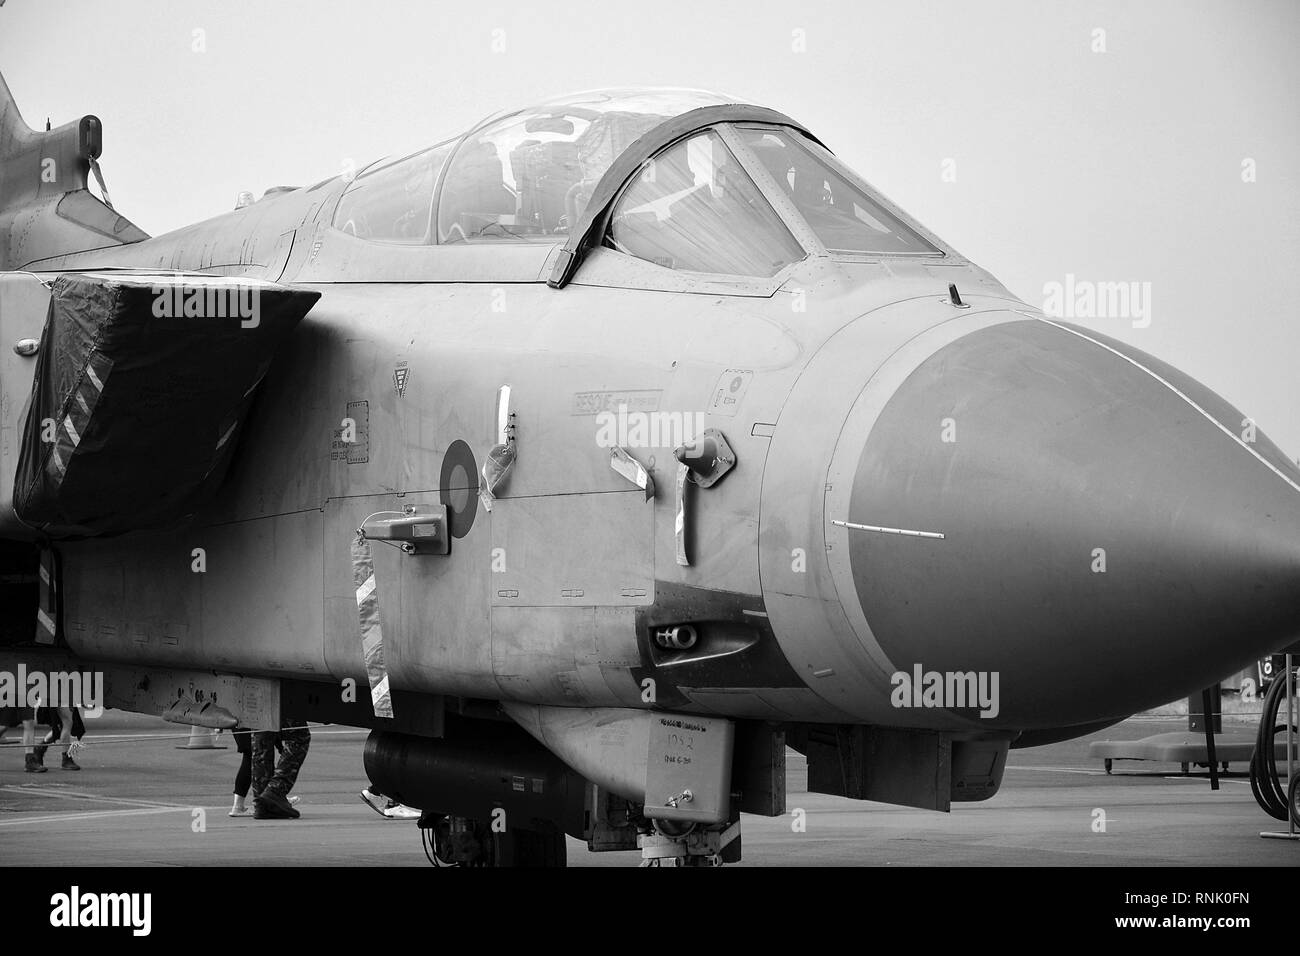 Panavia Tornado GR4, Jet fighter - Stock Image